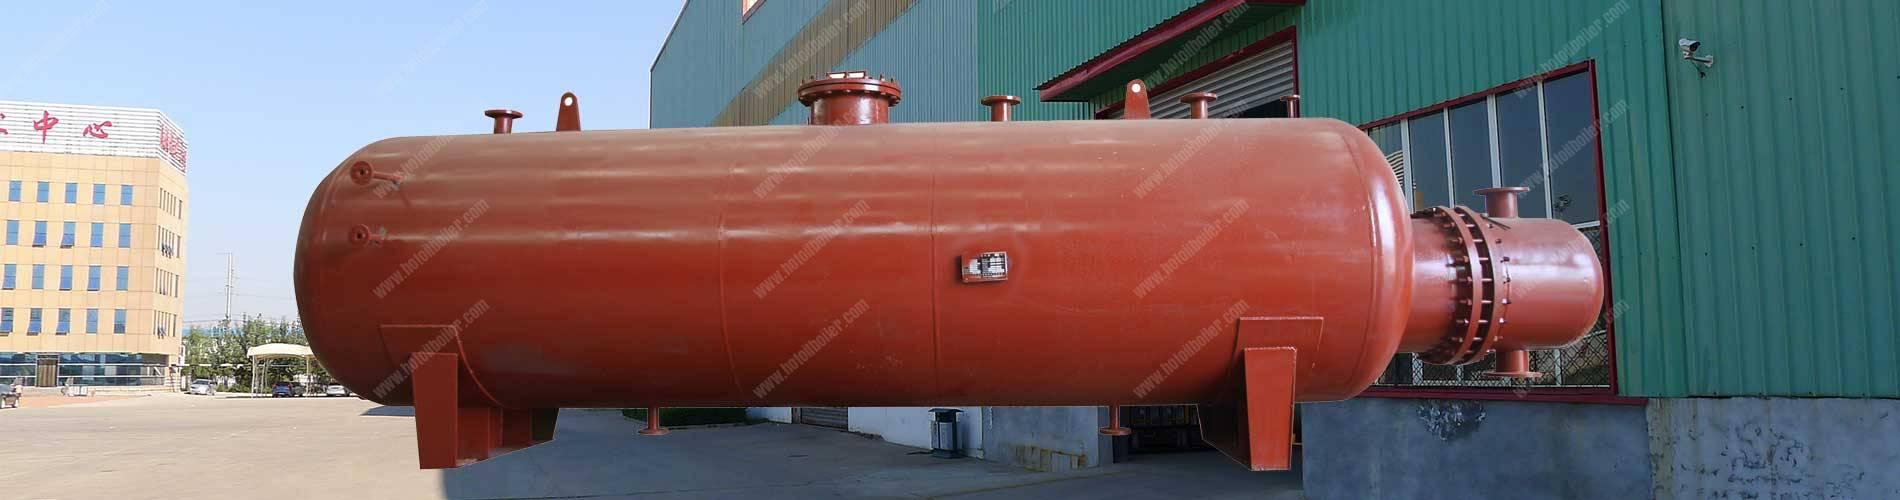 Thermal Oil Heating Steam Generators